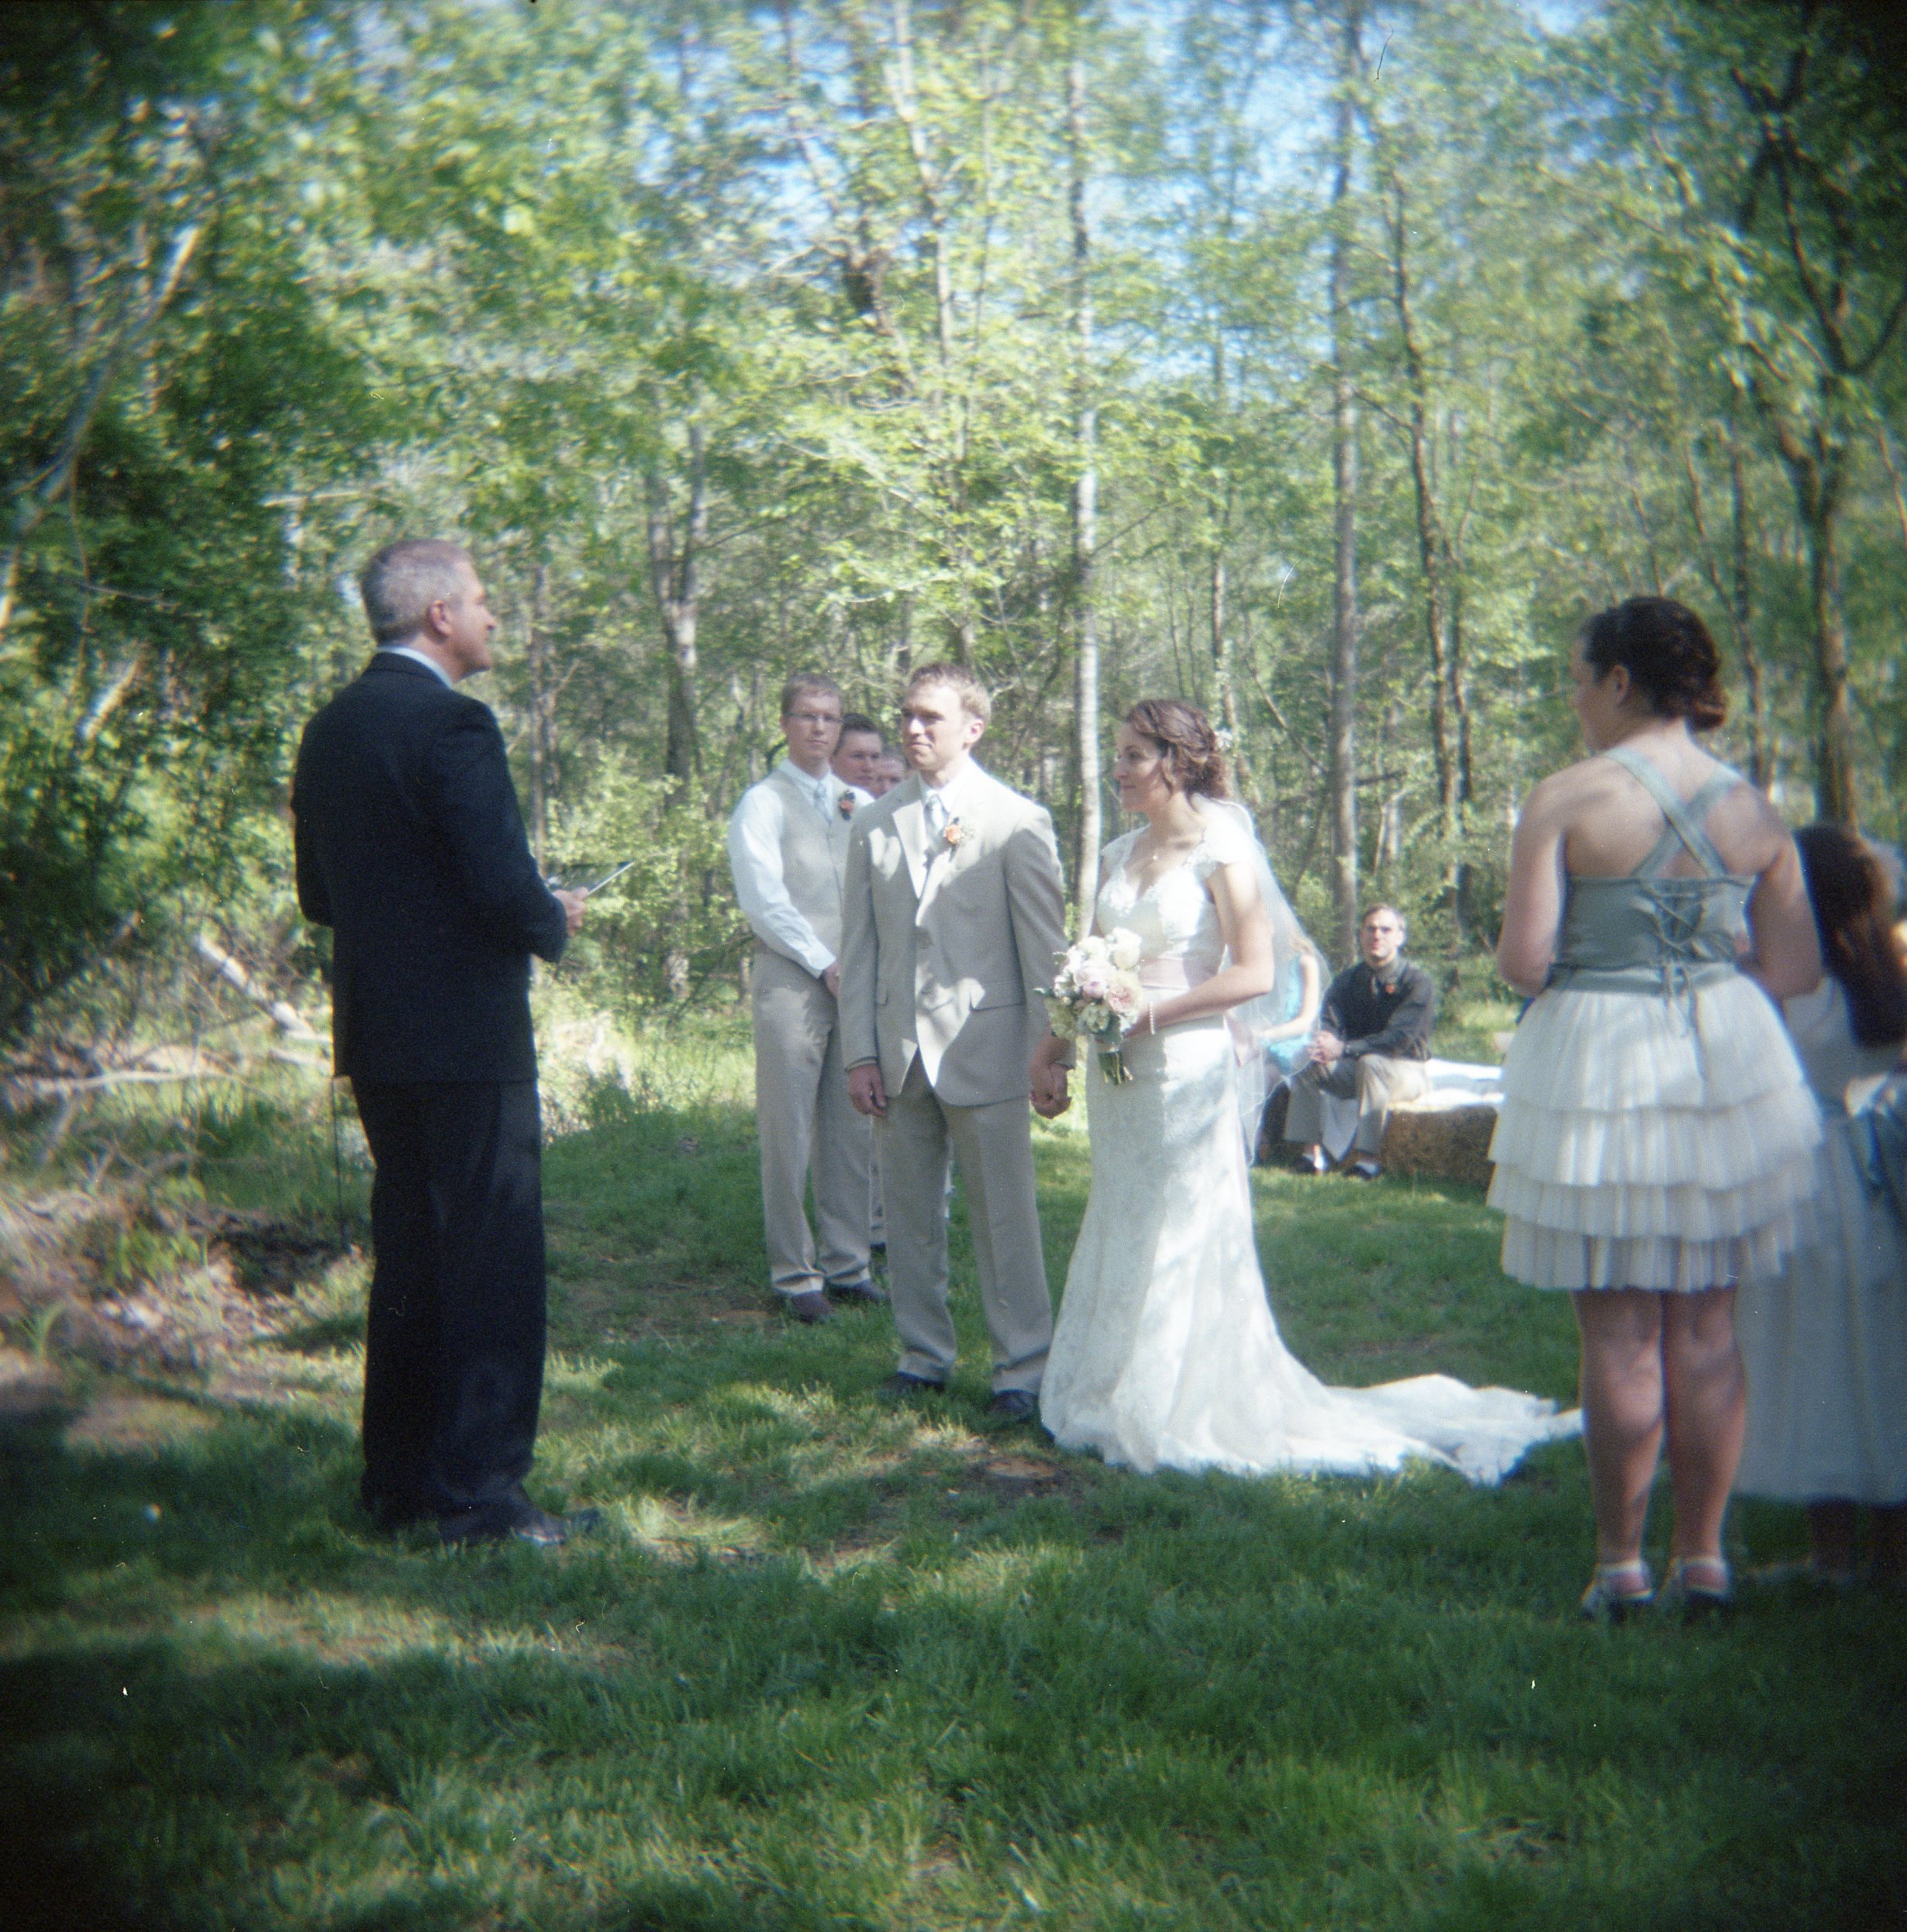 wedding_holgas019.jpg